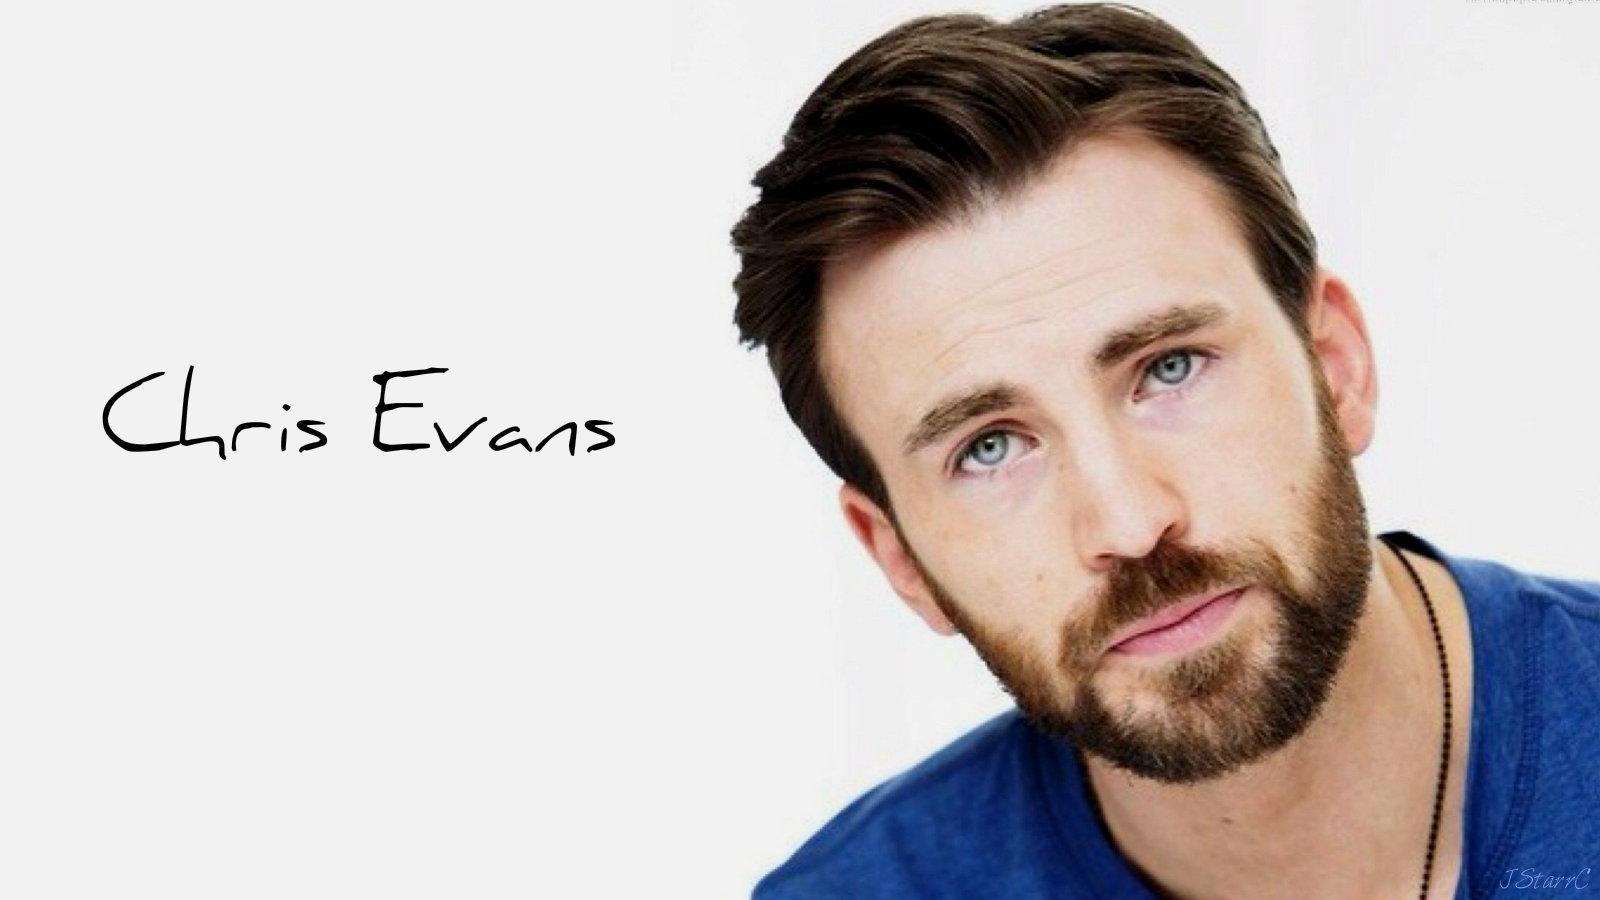 Chris Evans Chris Evans Wallpaper 41696688 Fanpop